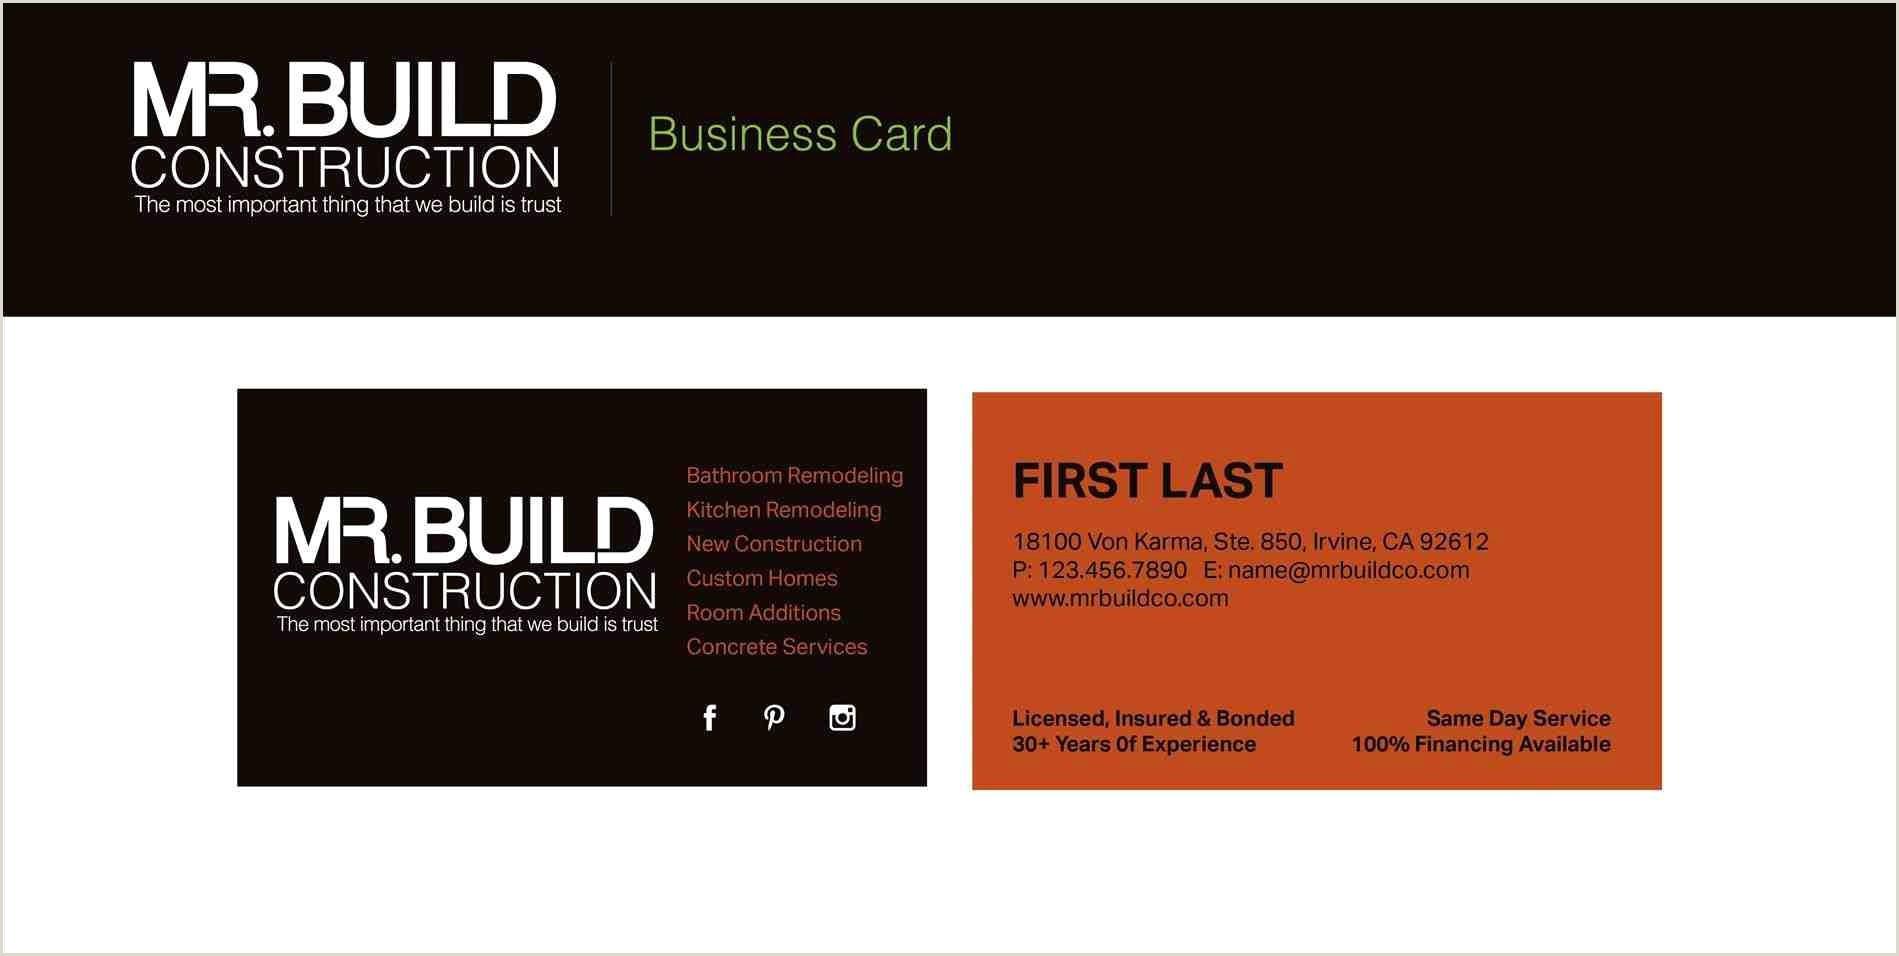 Business Card Sample Design 14 Popular Hardwood Flooring Business Card Template